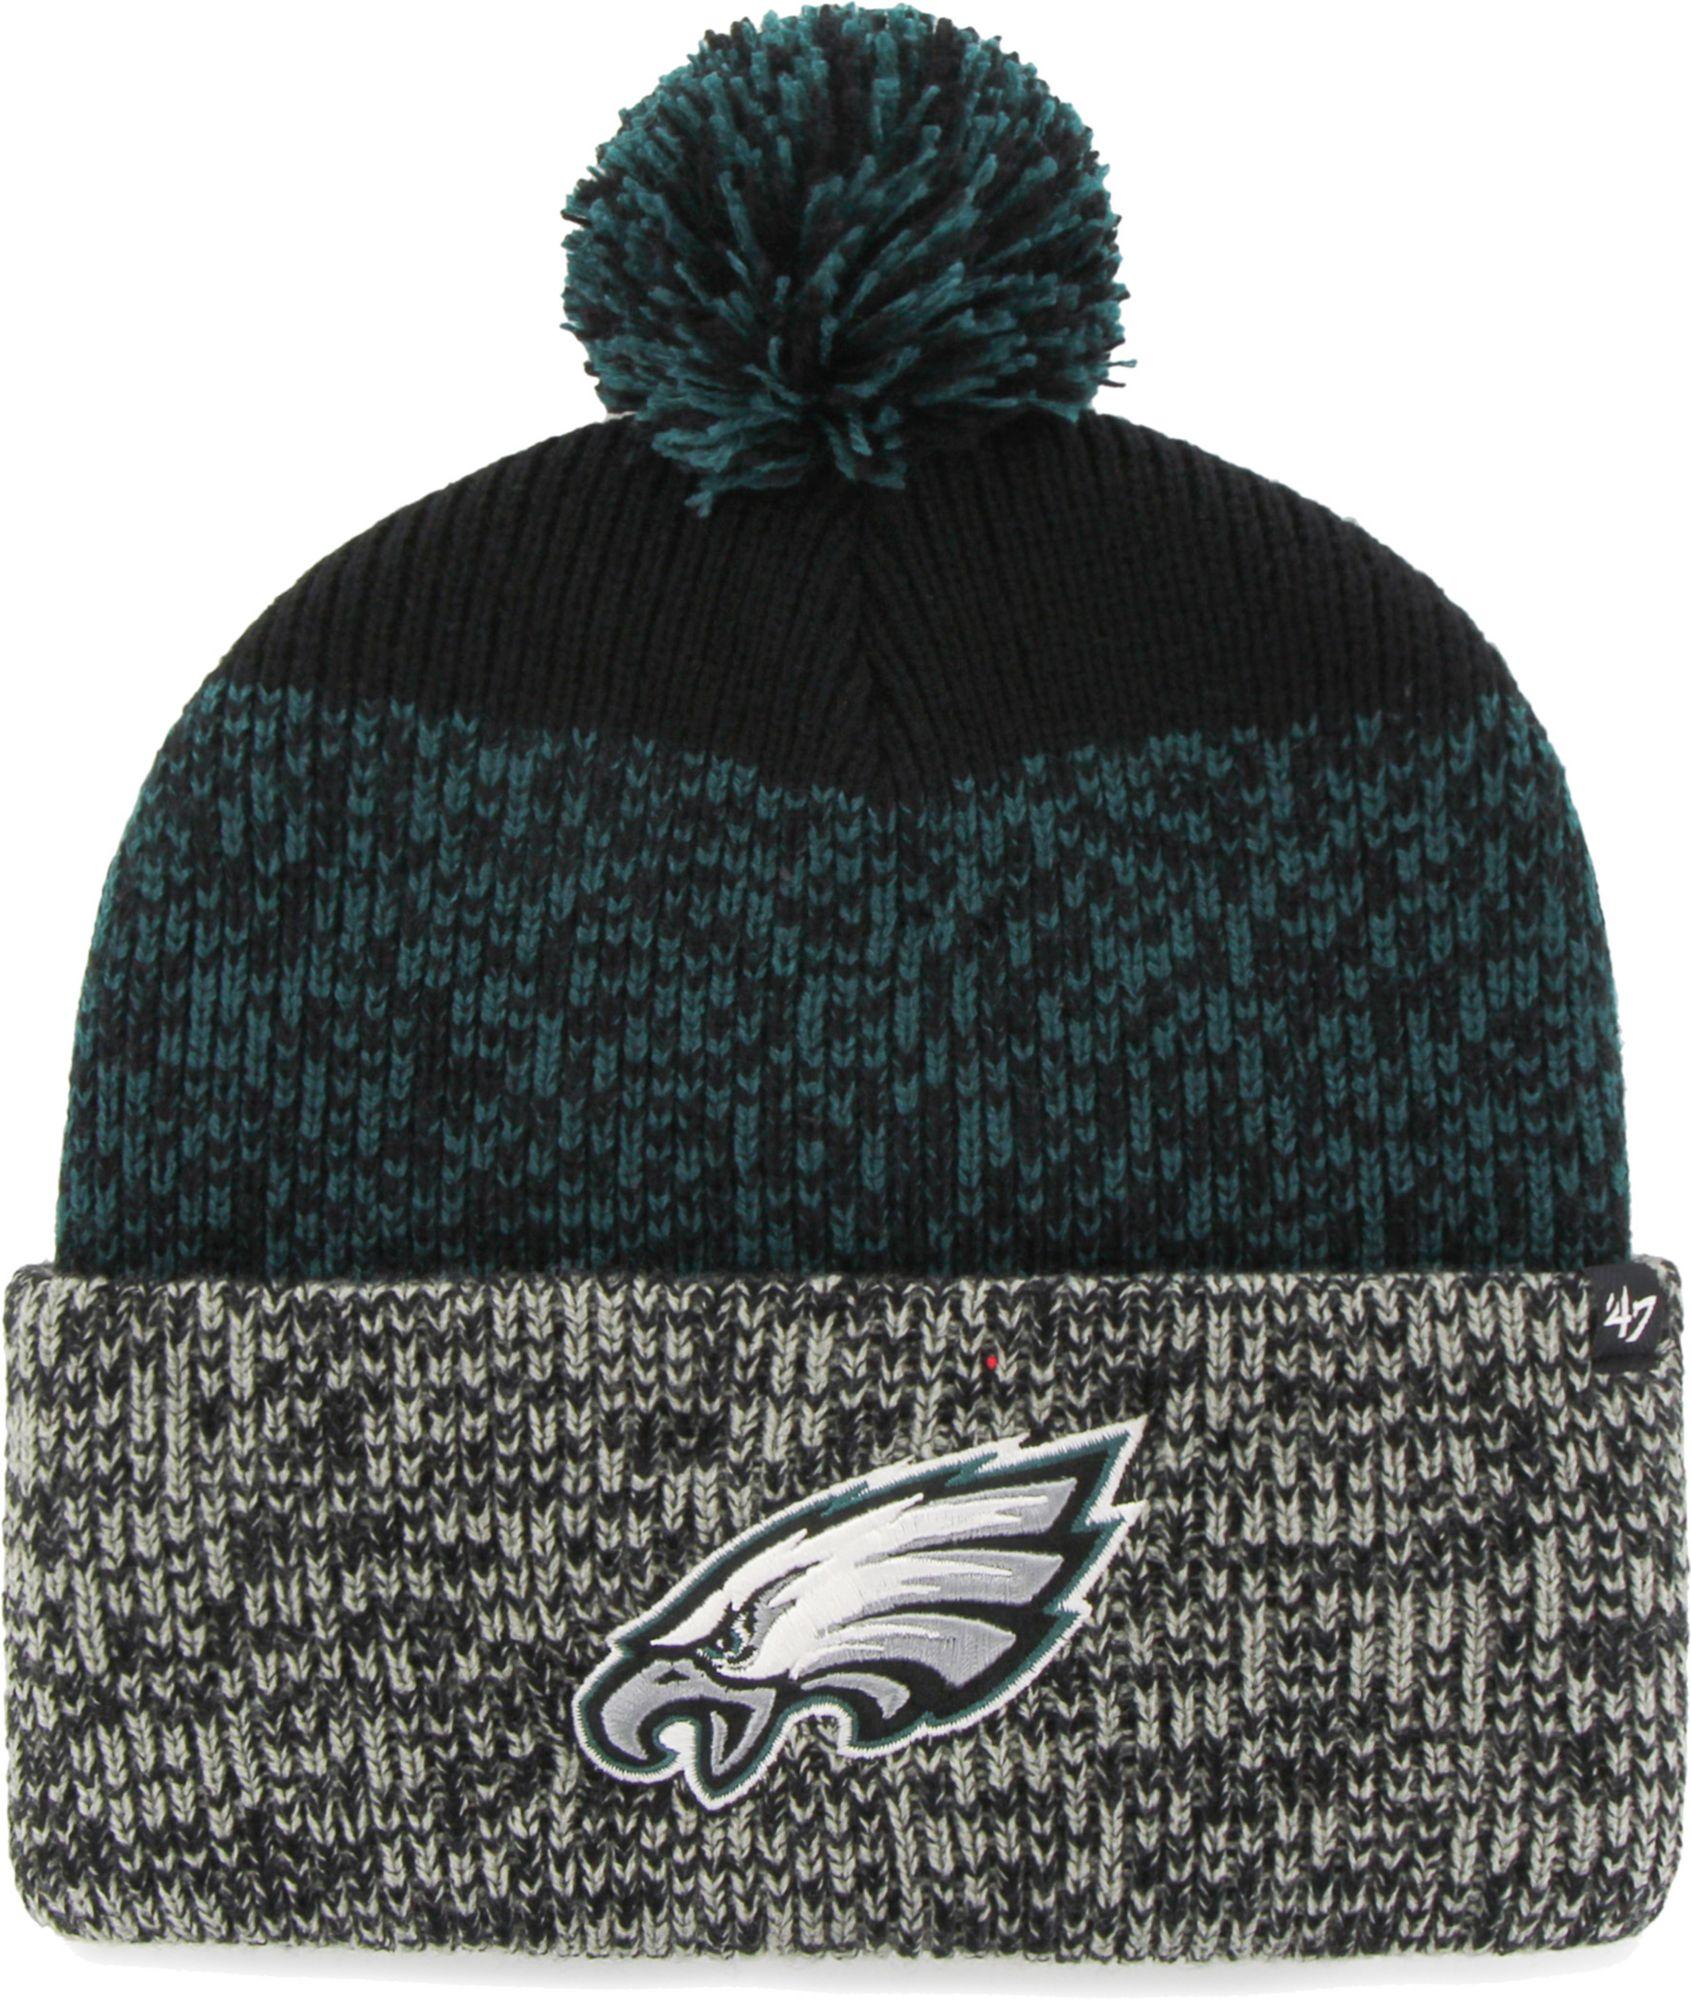 9e4bba1eb '47 Men's Philadelphia Eagles Static Cuffed Knit